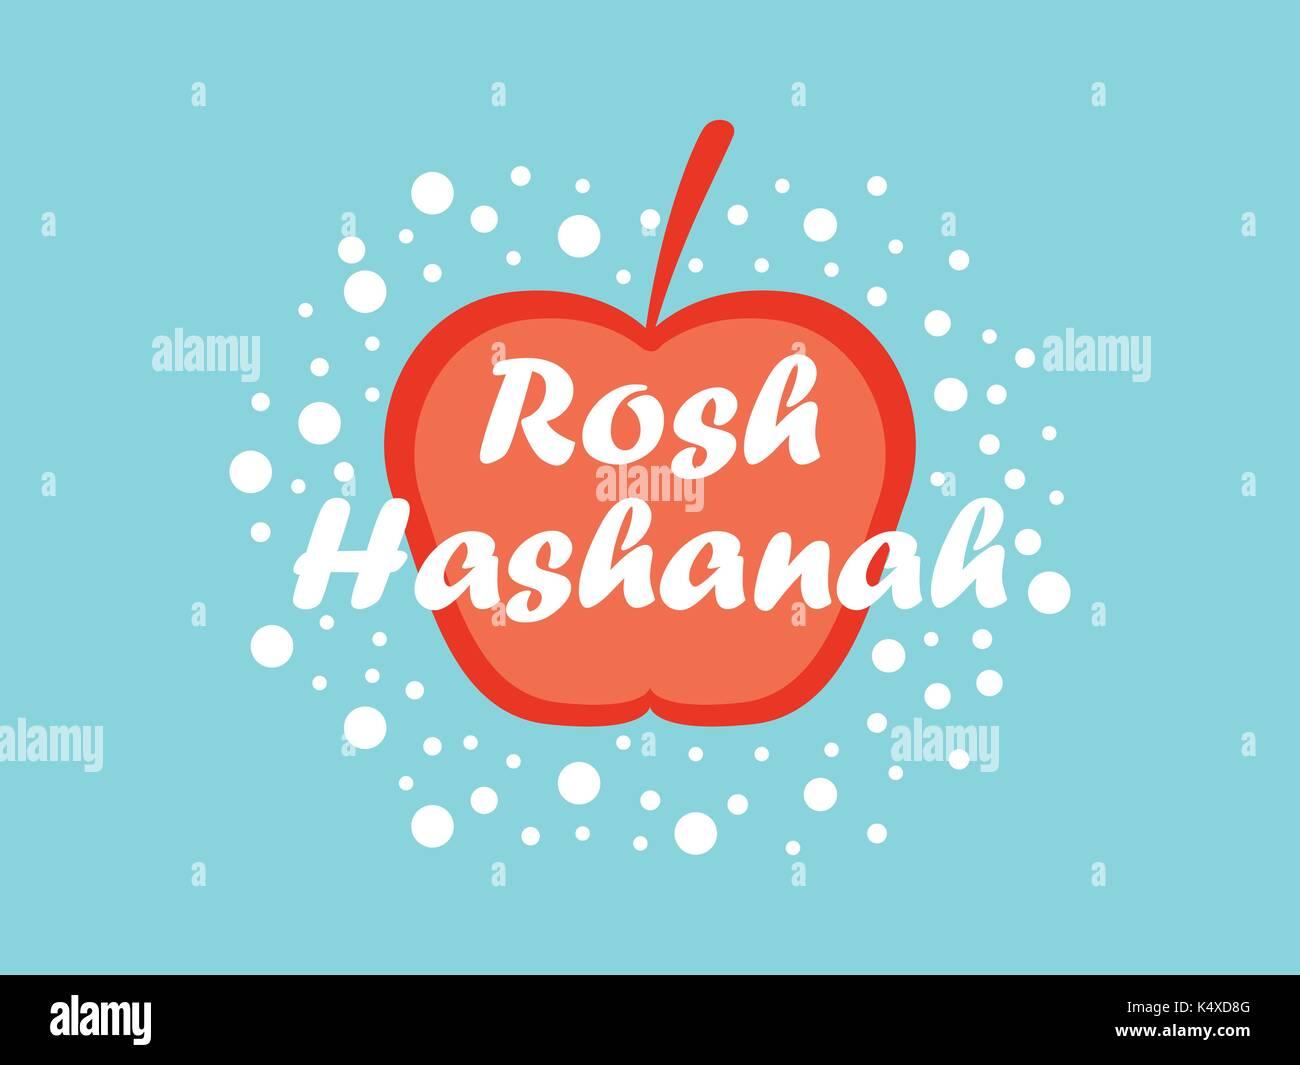 Jewish new year greeting card stock photos jewish new year rosh hashanah greeting card design jewish new year shana tova red apple m4hsunfo